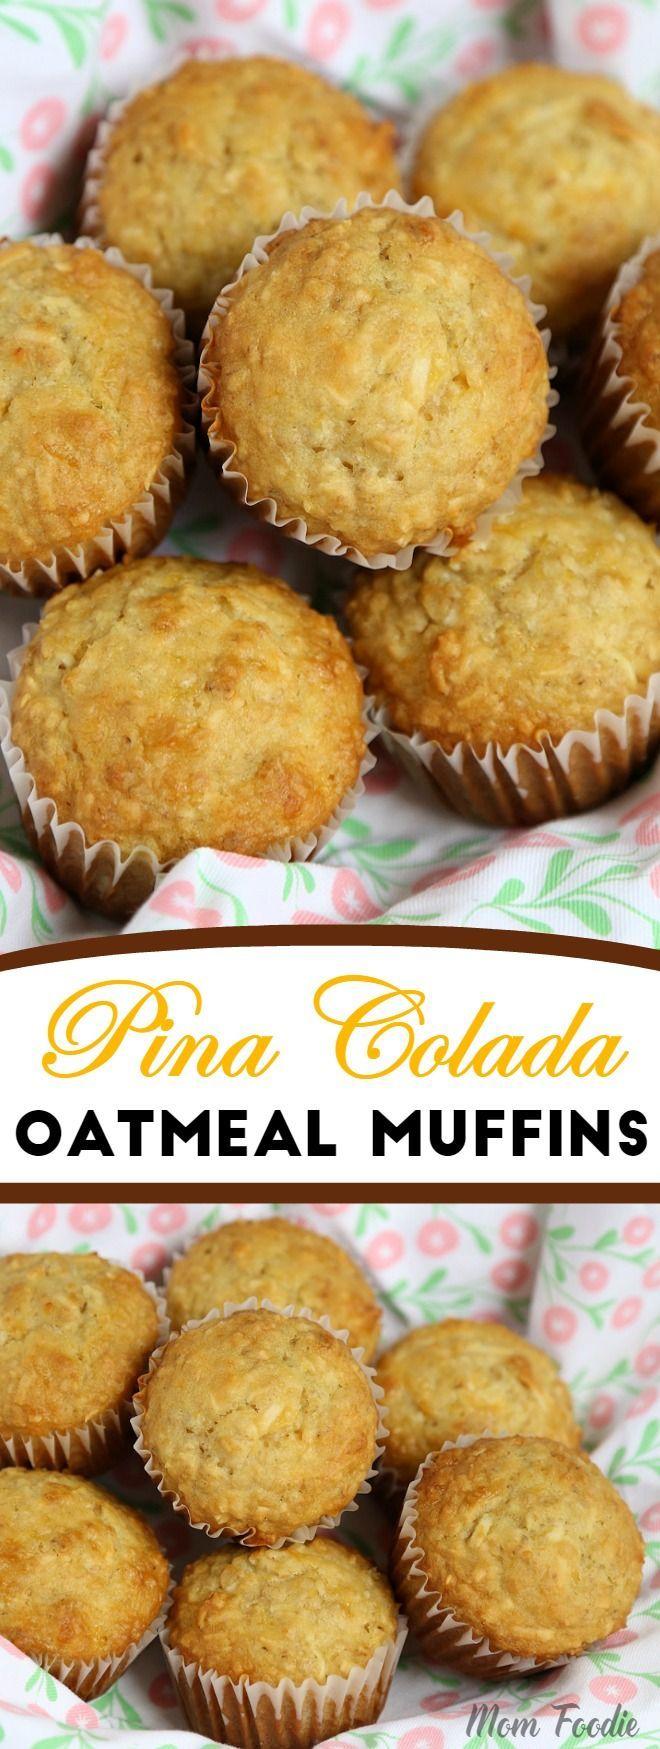 oatmeal muffins oatmeal muffin recipe oatmeal muffins coconut ...